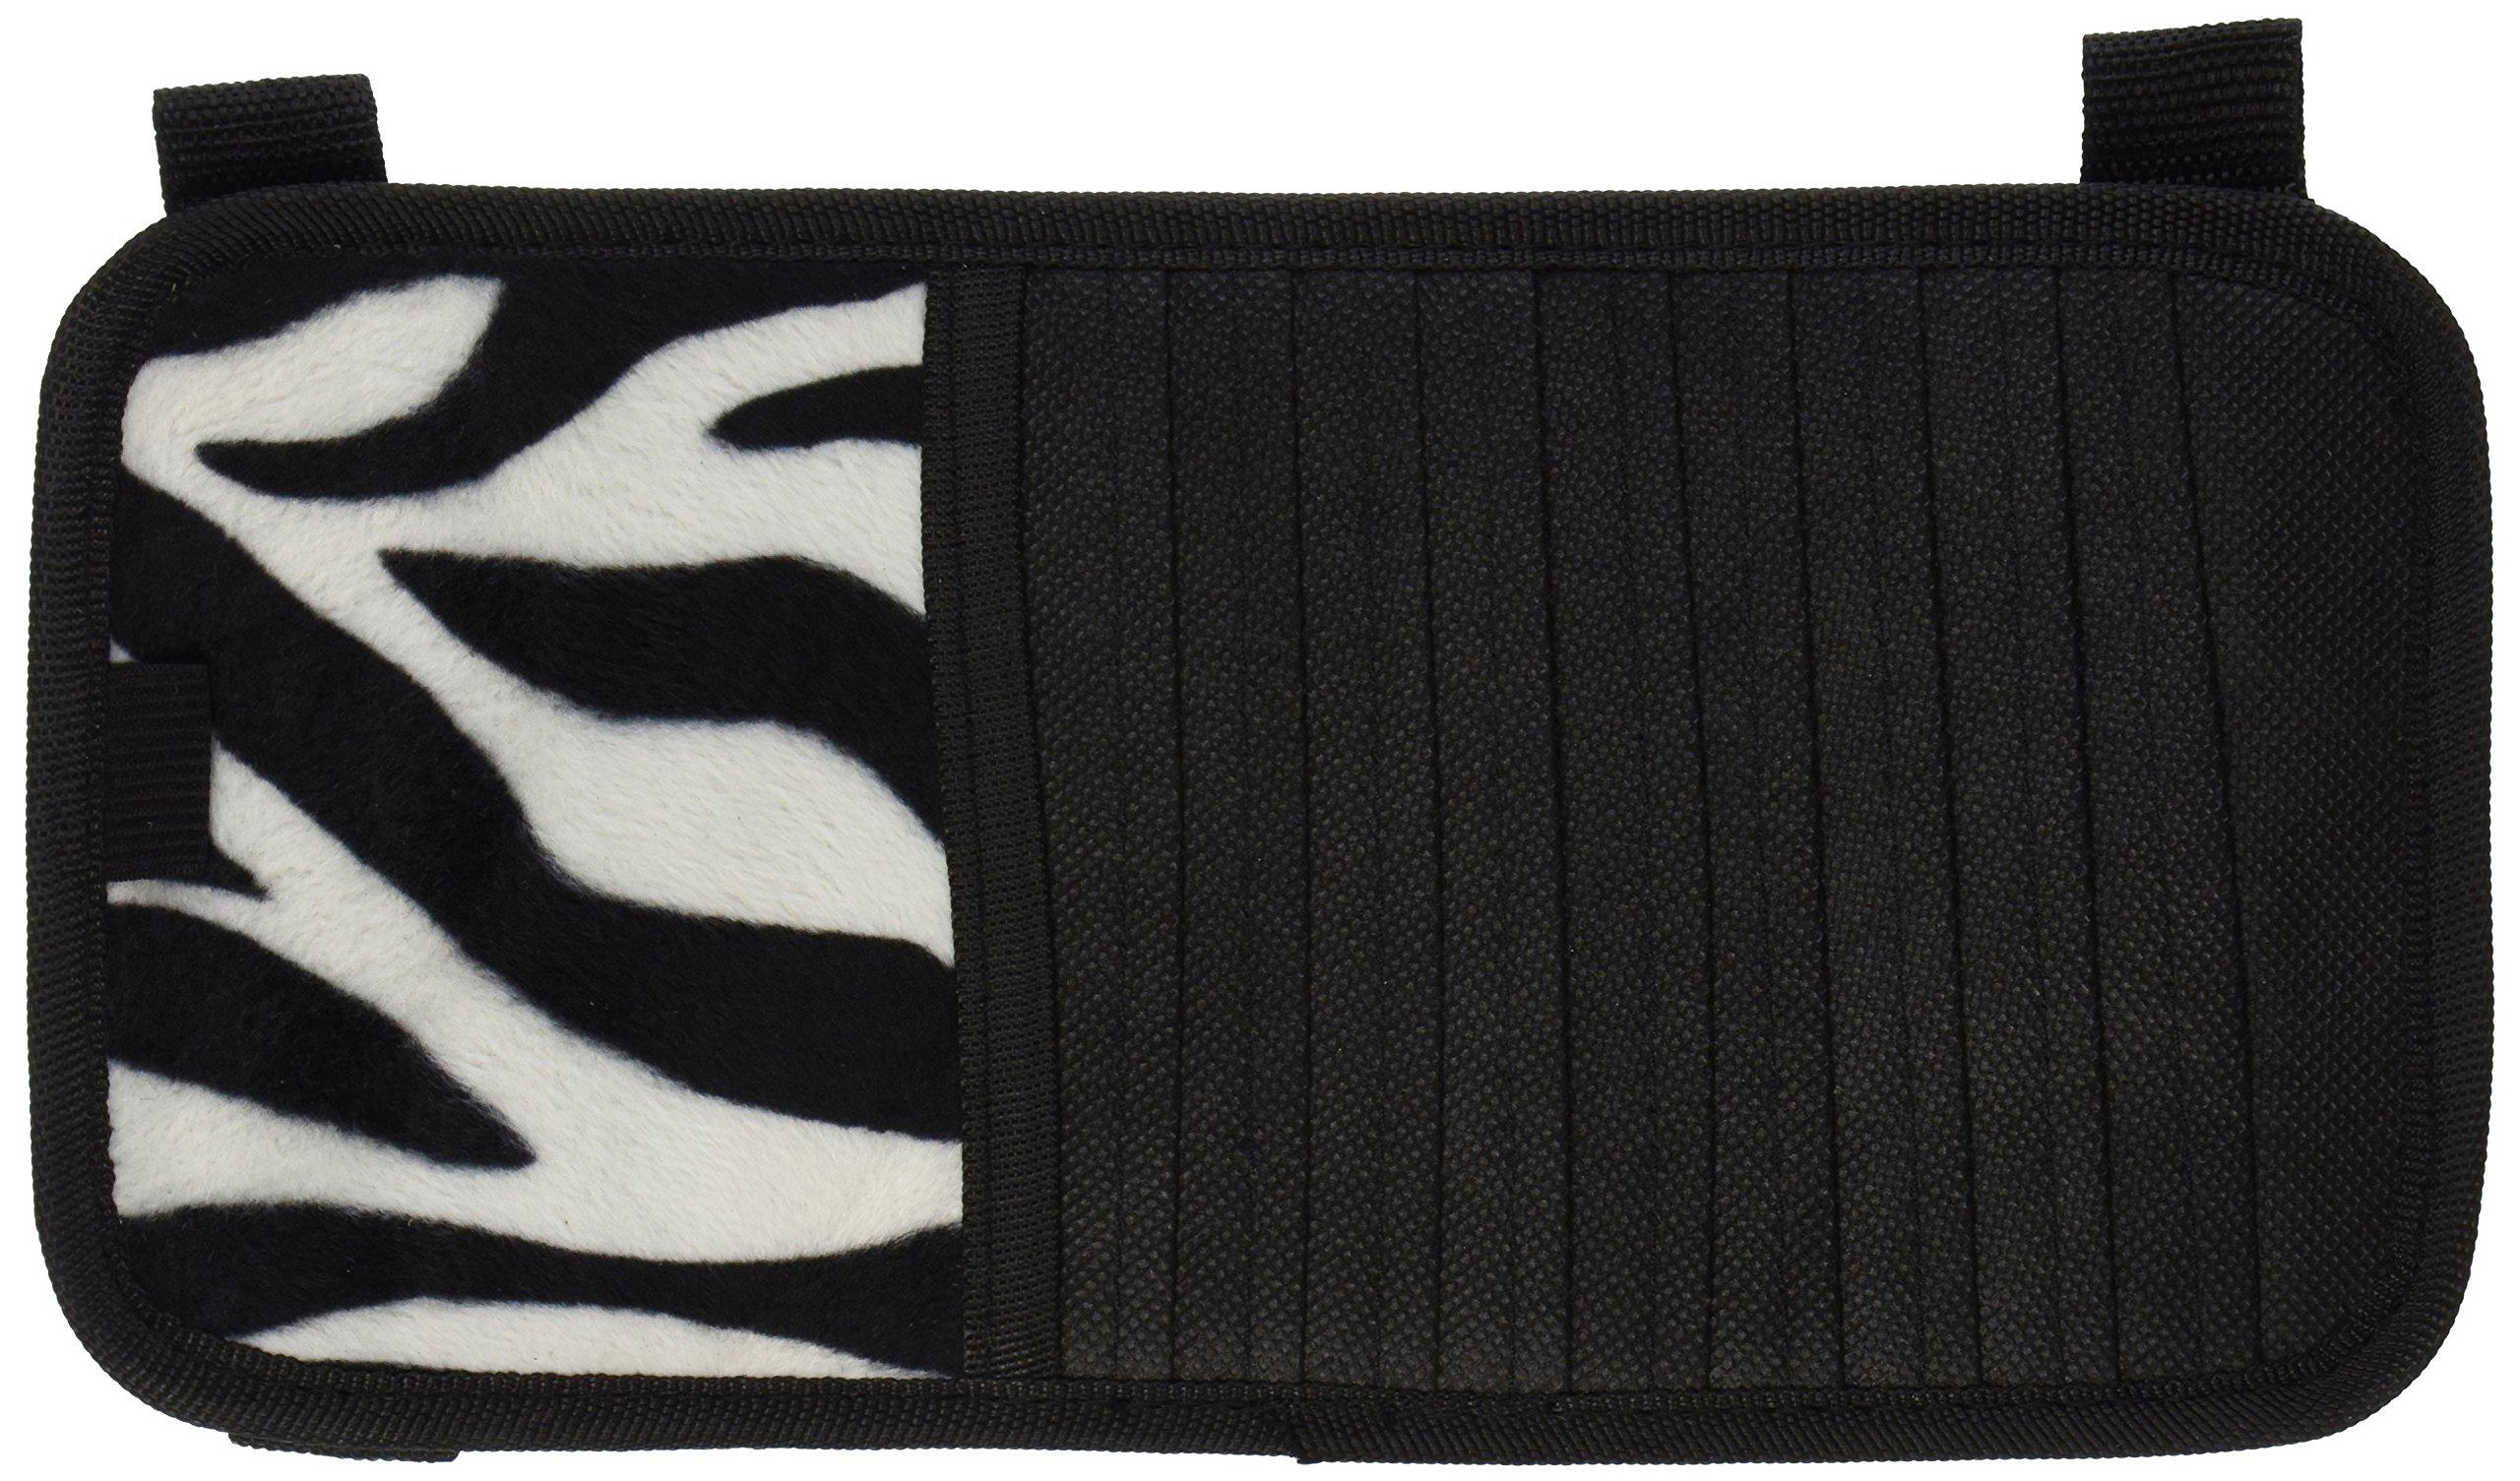 LA Auto Gear White Zebra Animal Print 10 CD/DVD Car Visor Organizer